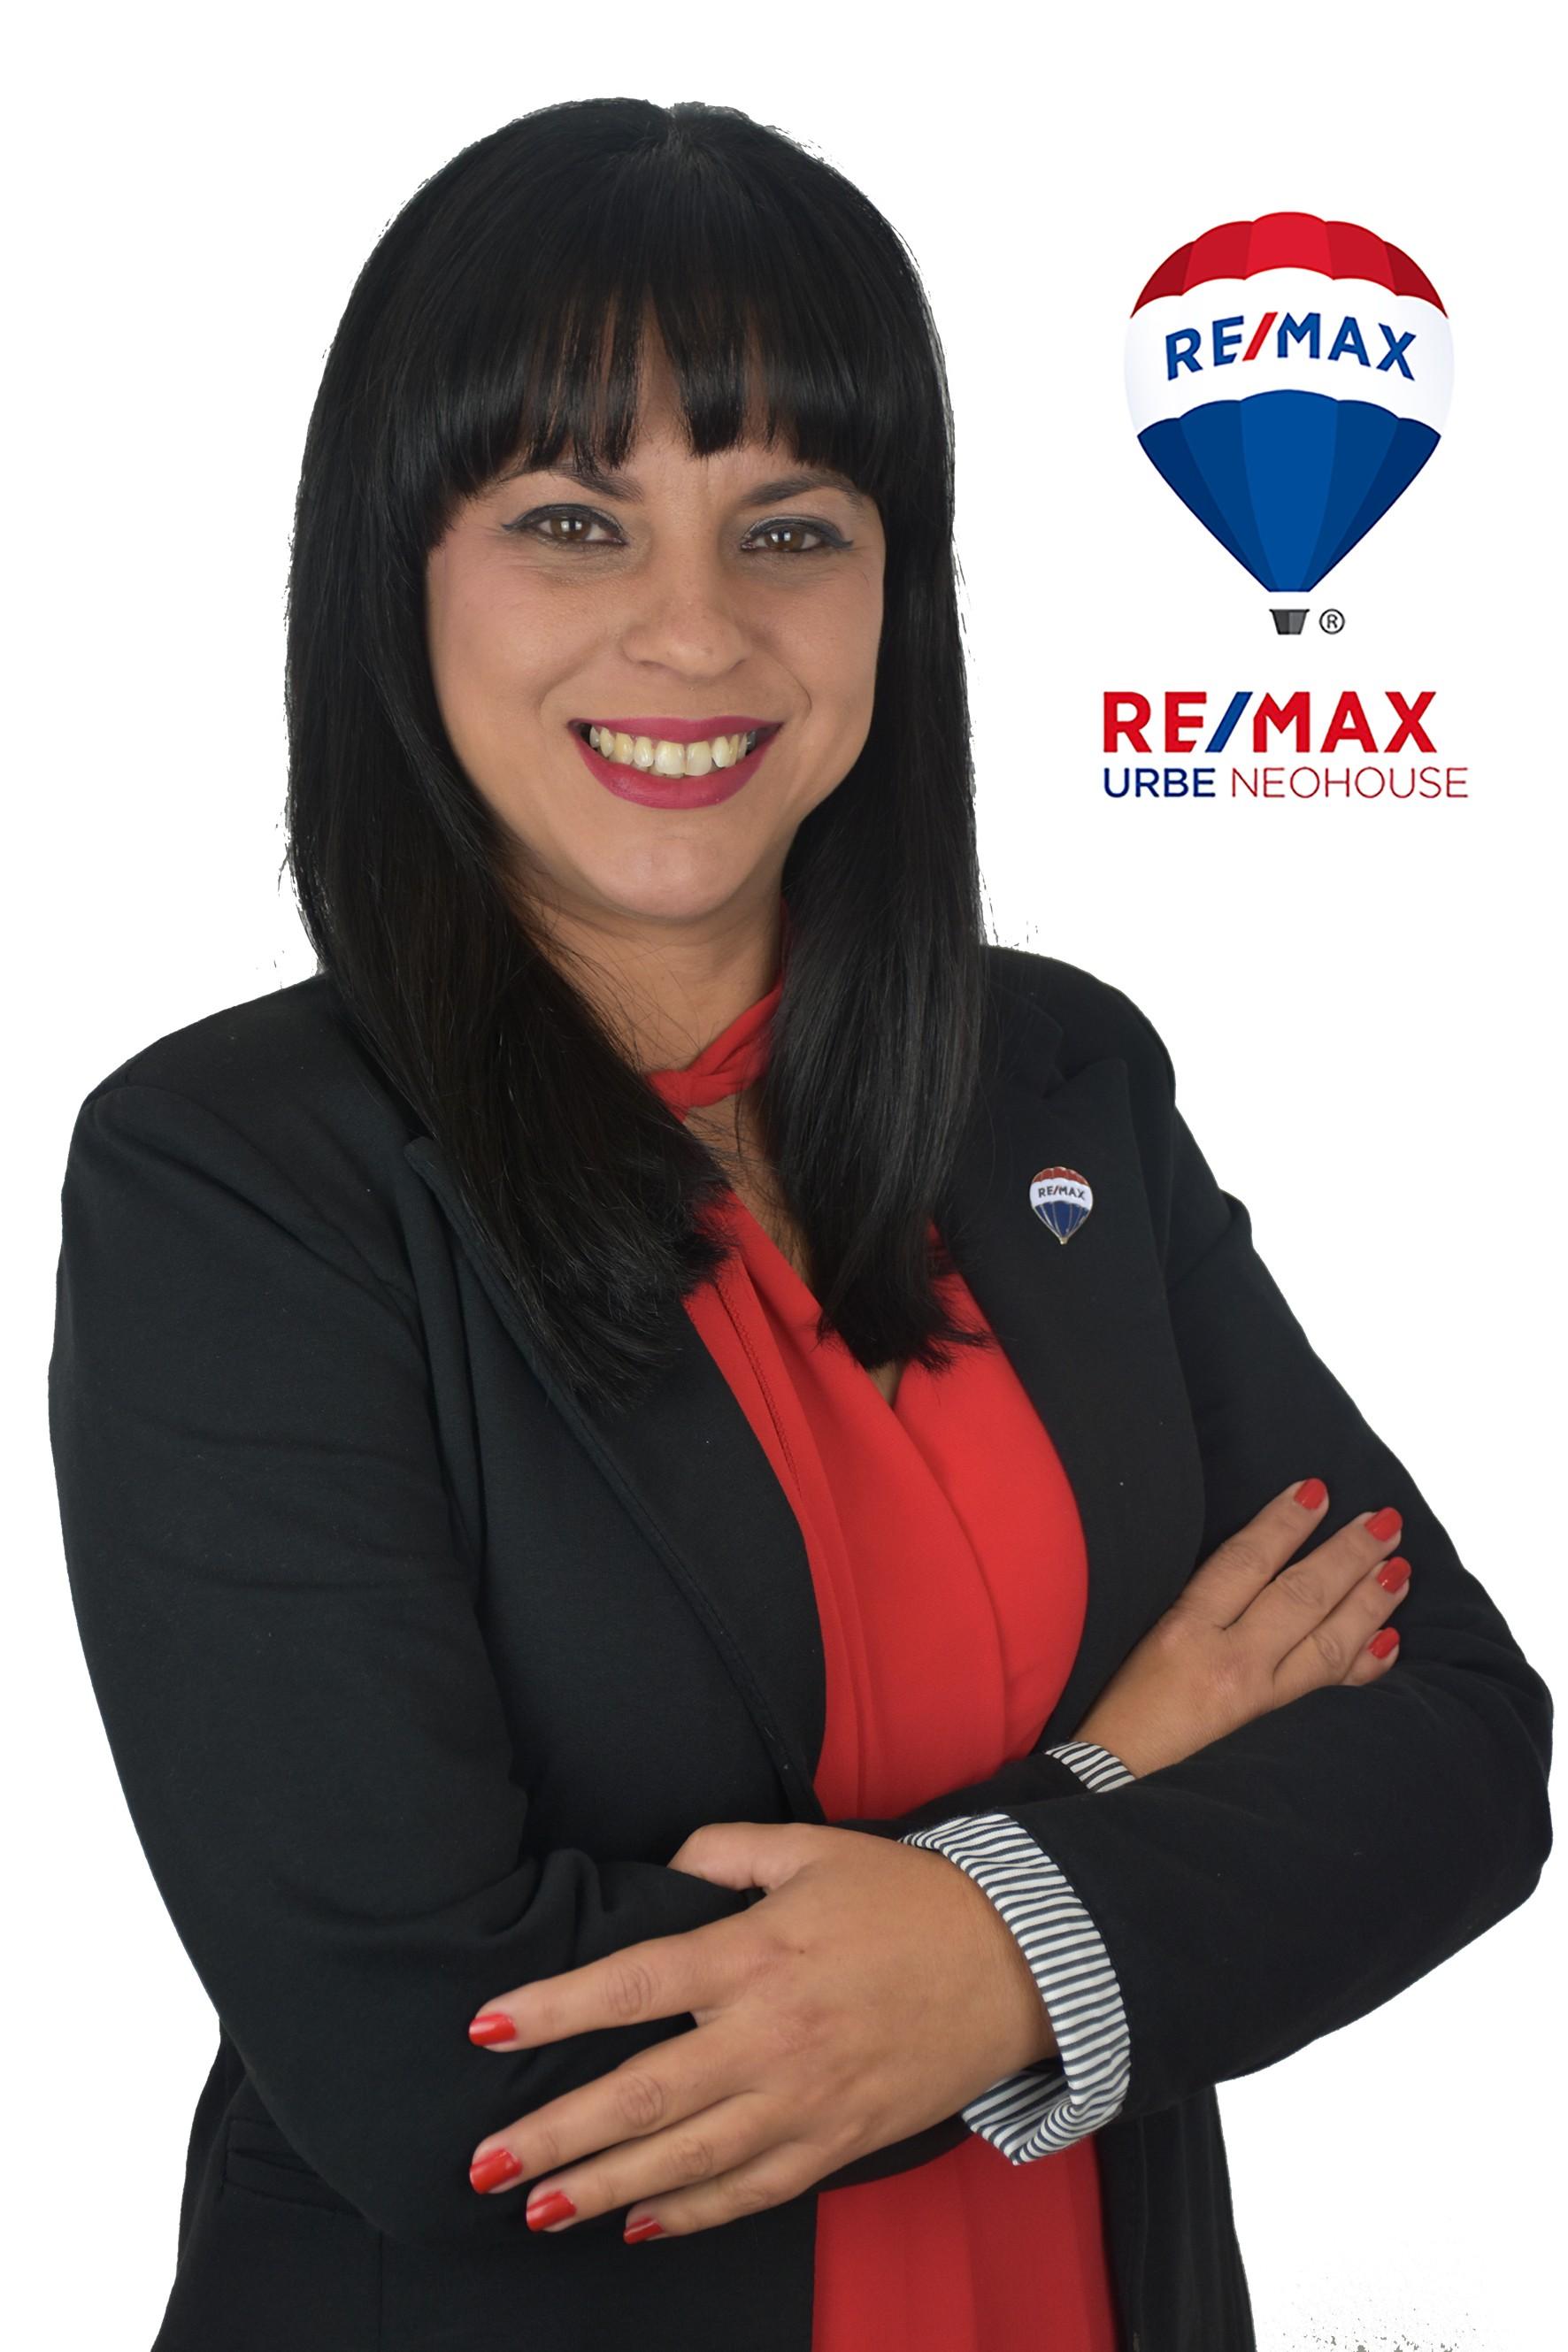 Mayeli González Dominguez